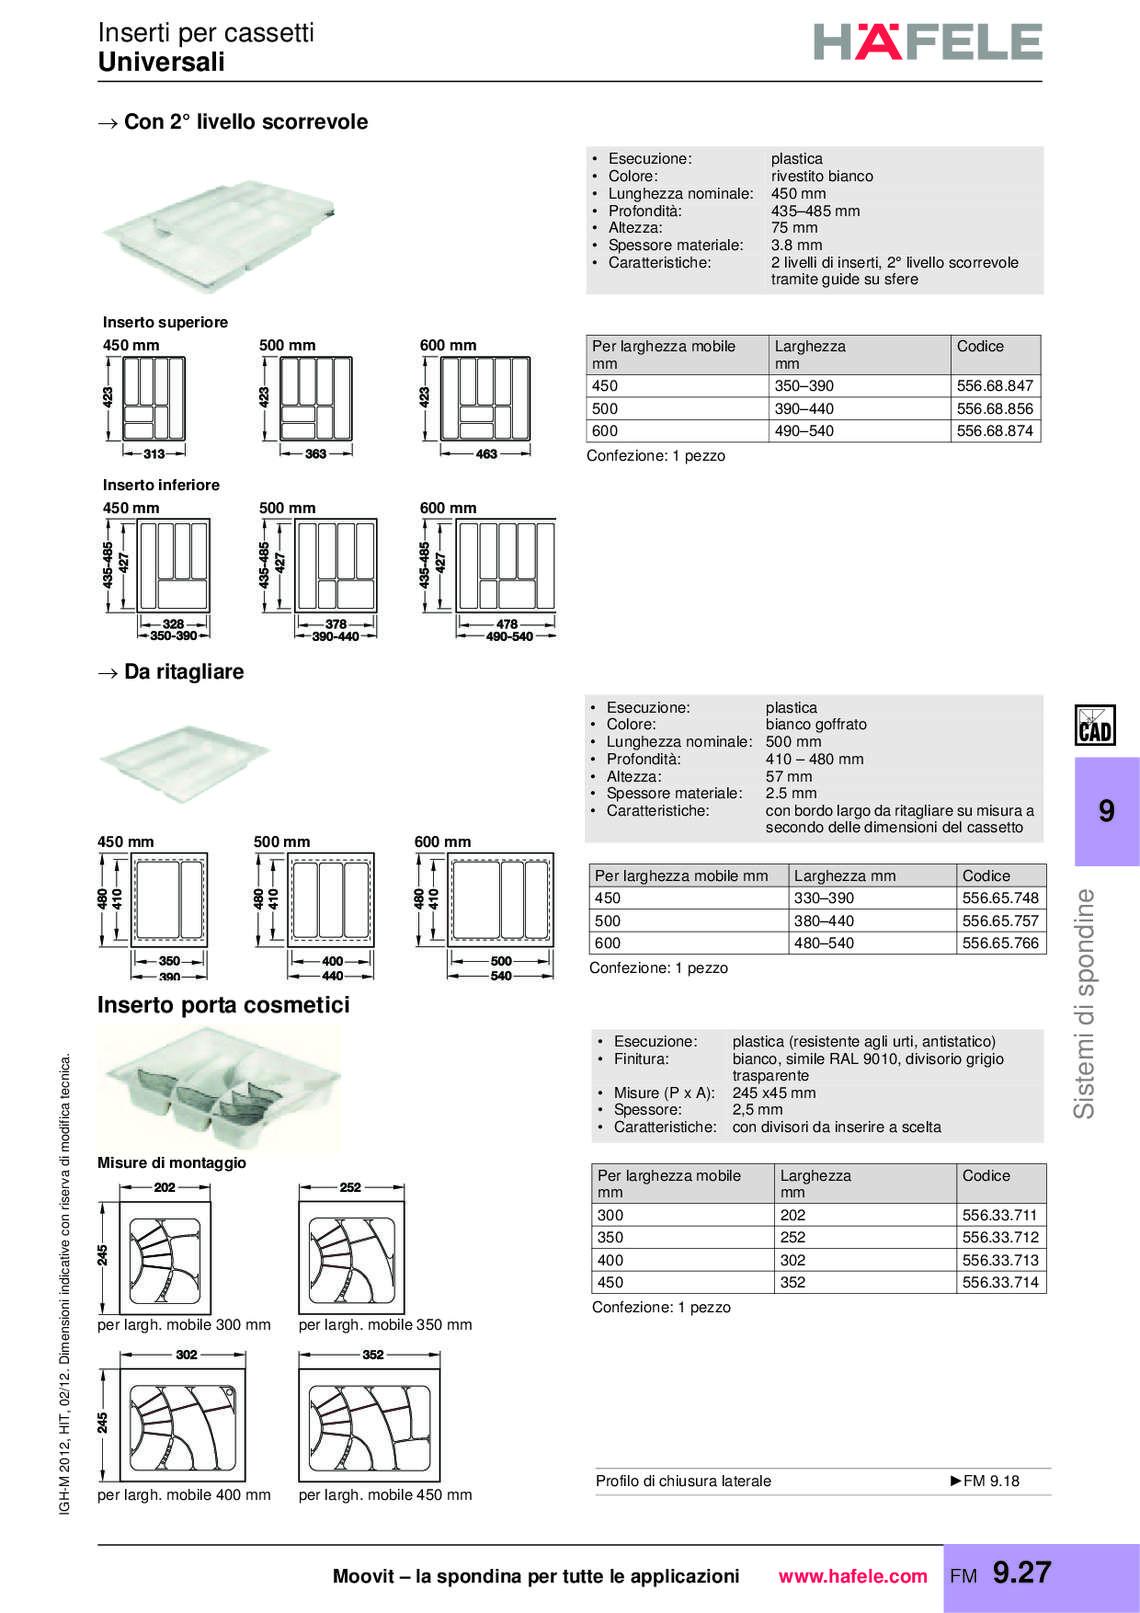 hafele-spondine-e-guide-per-mobili_40_040.jpg